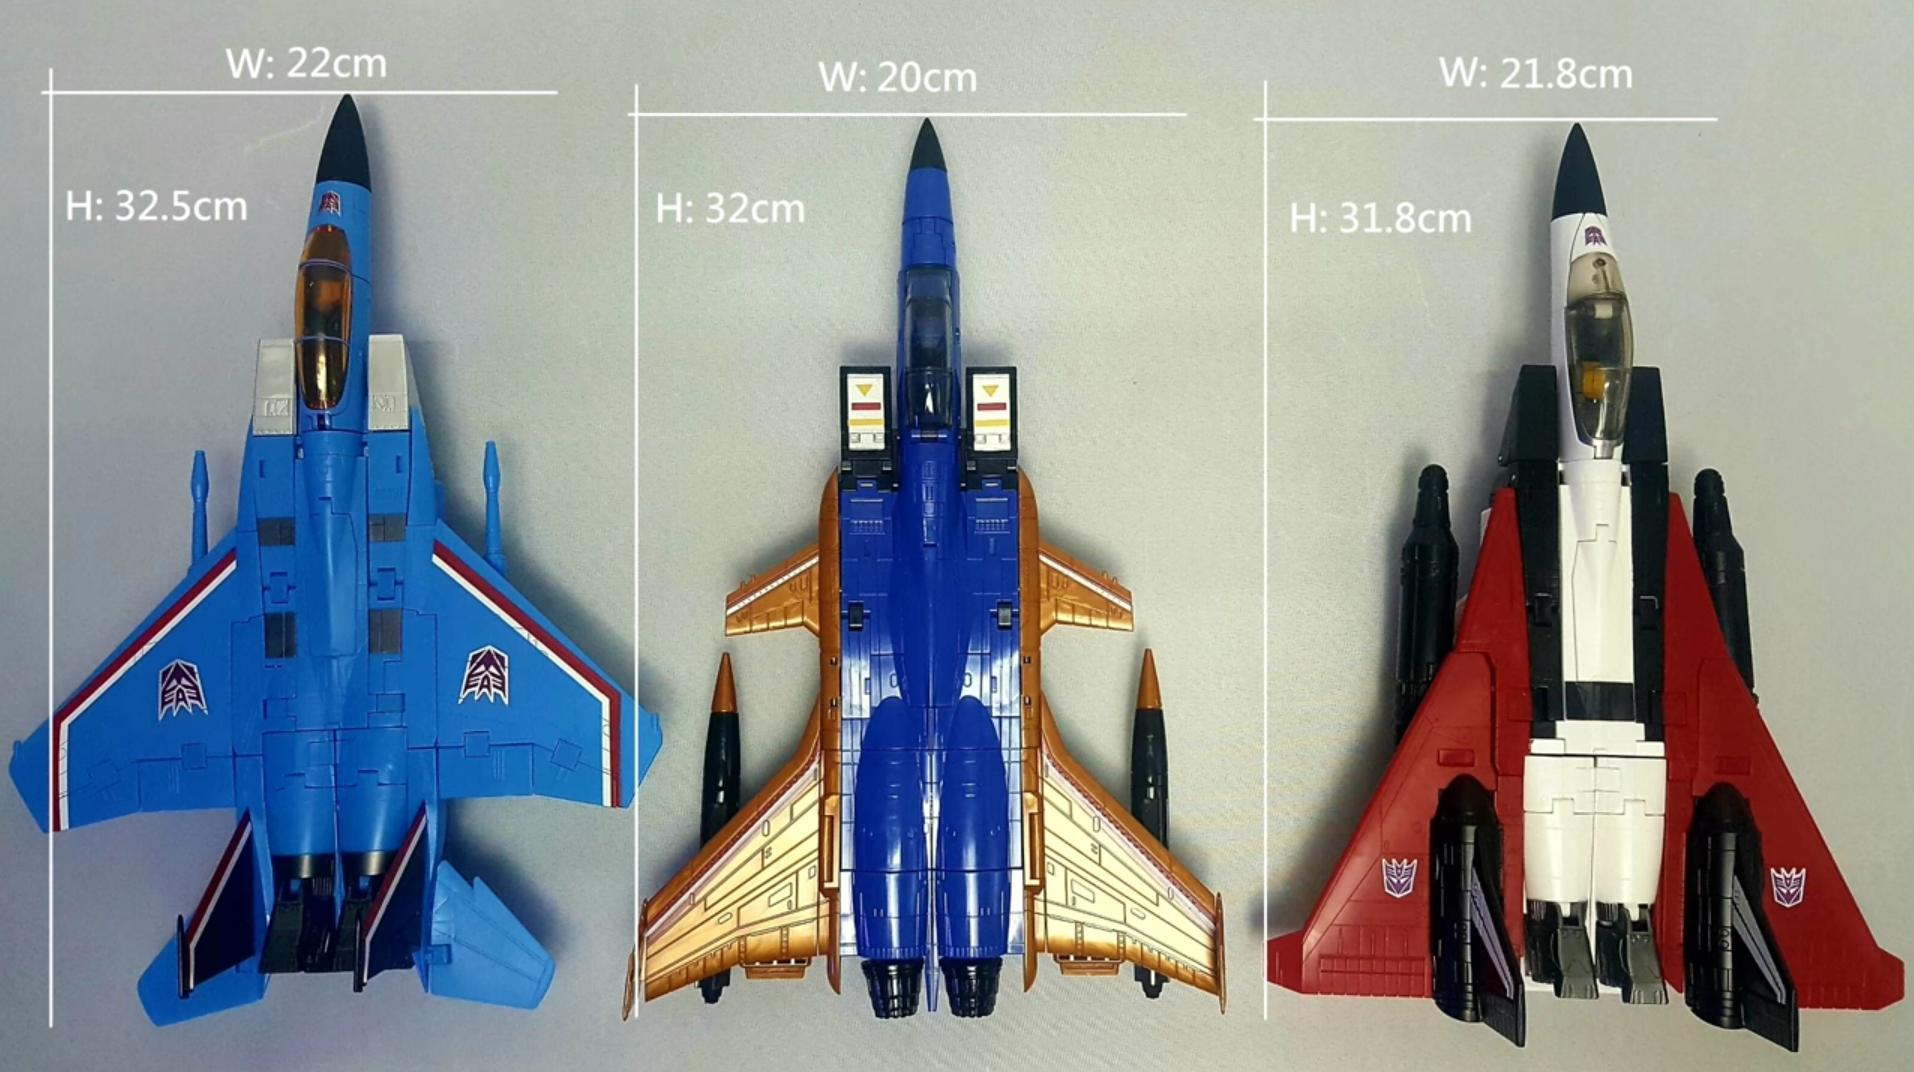 [ToyWorld] Produit Tiers - TW-M02A Combustor (Ramjet/Statoréacto), TW-M02B Assault (Thrust/Fatalo), TW-M02C Requiem (Dirge/Funébro) - Page 2 H2GvwK5u